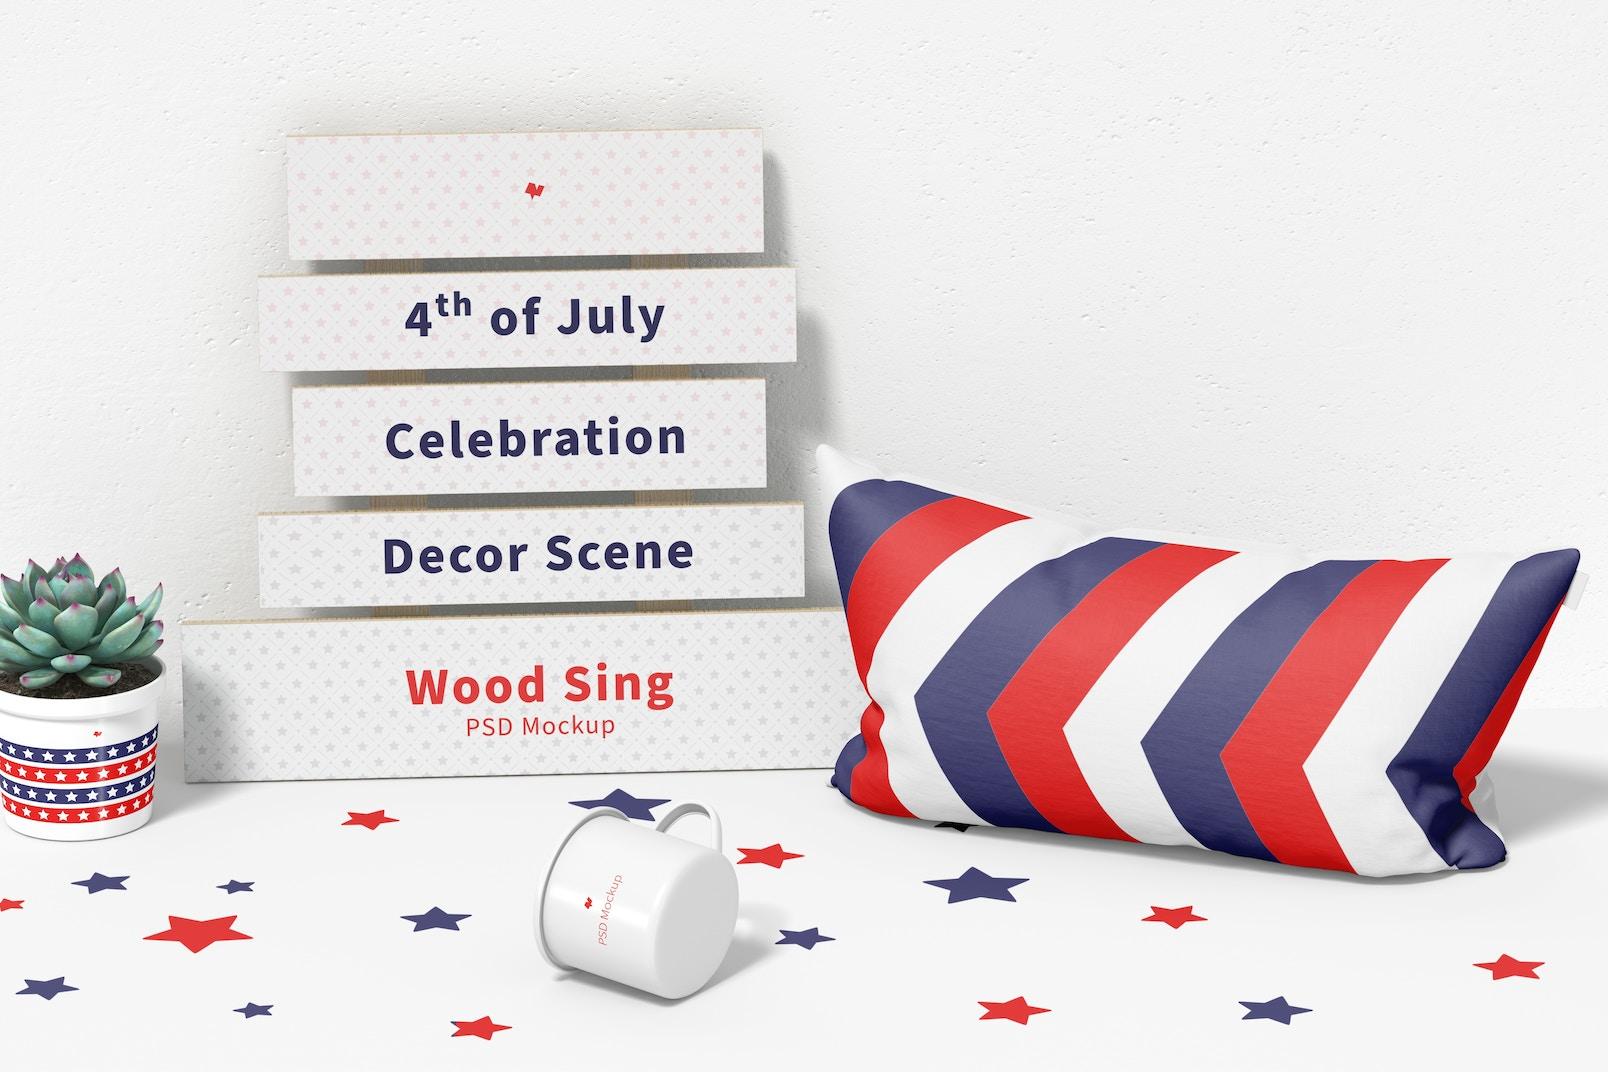 4th of July Celebration Decor Scene Mockup, Perspective